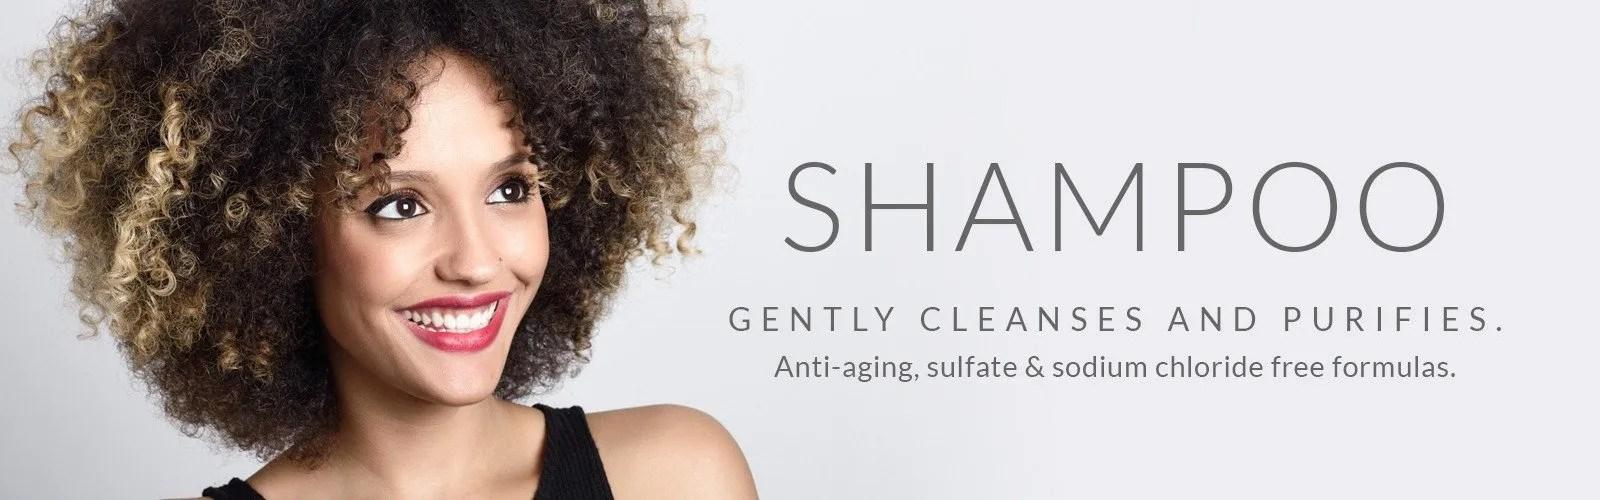 Number 4 Organic Vegan Shampoos